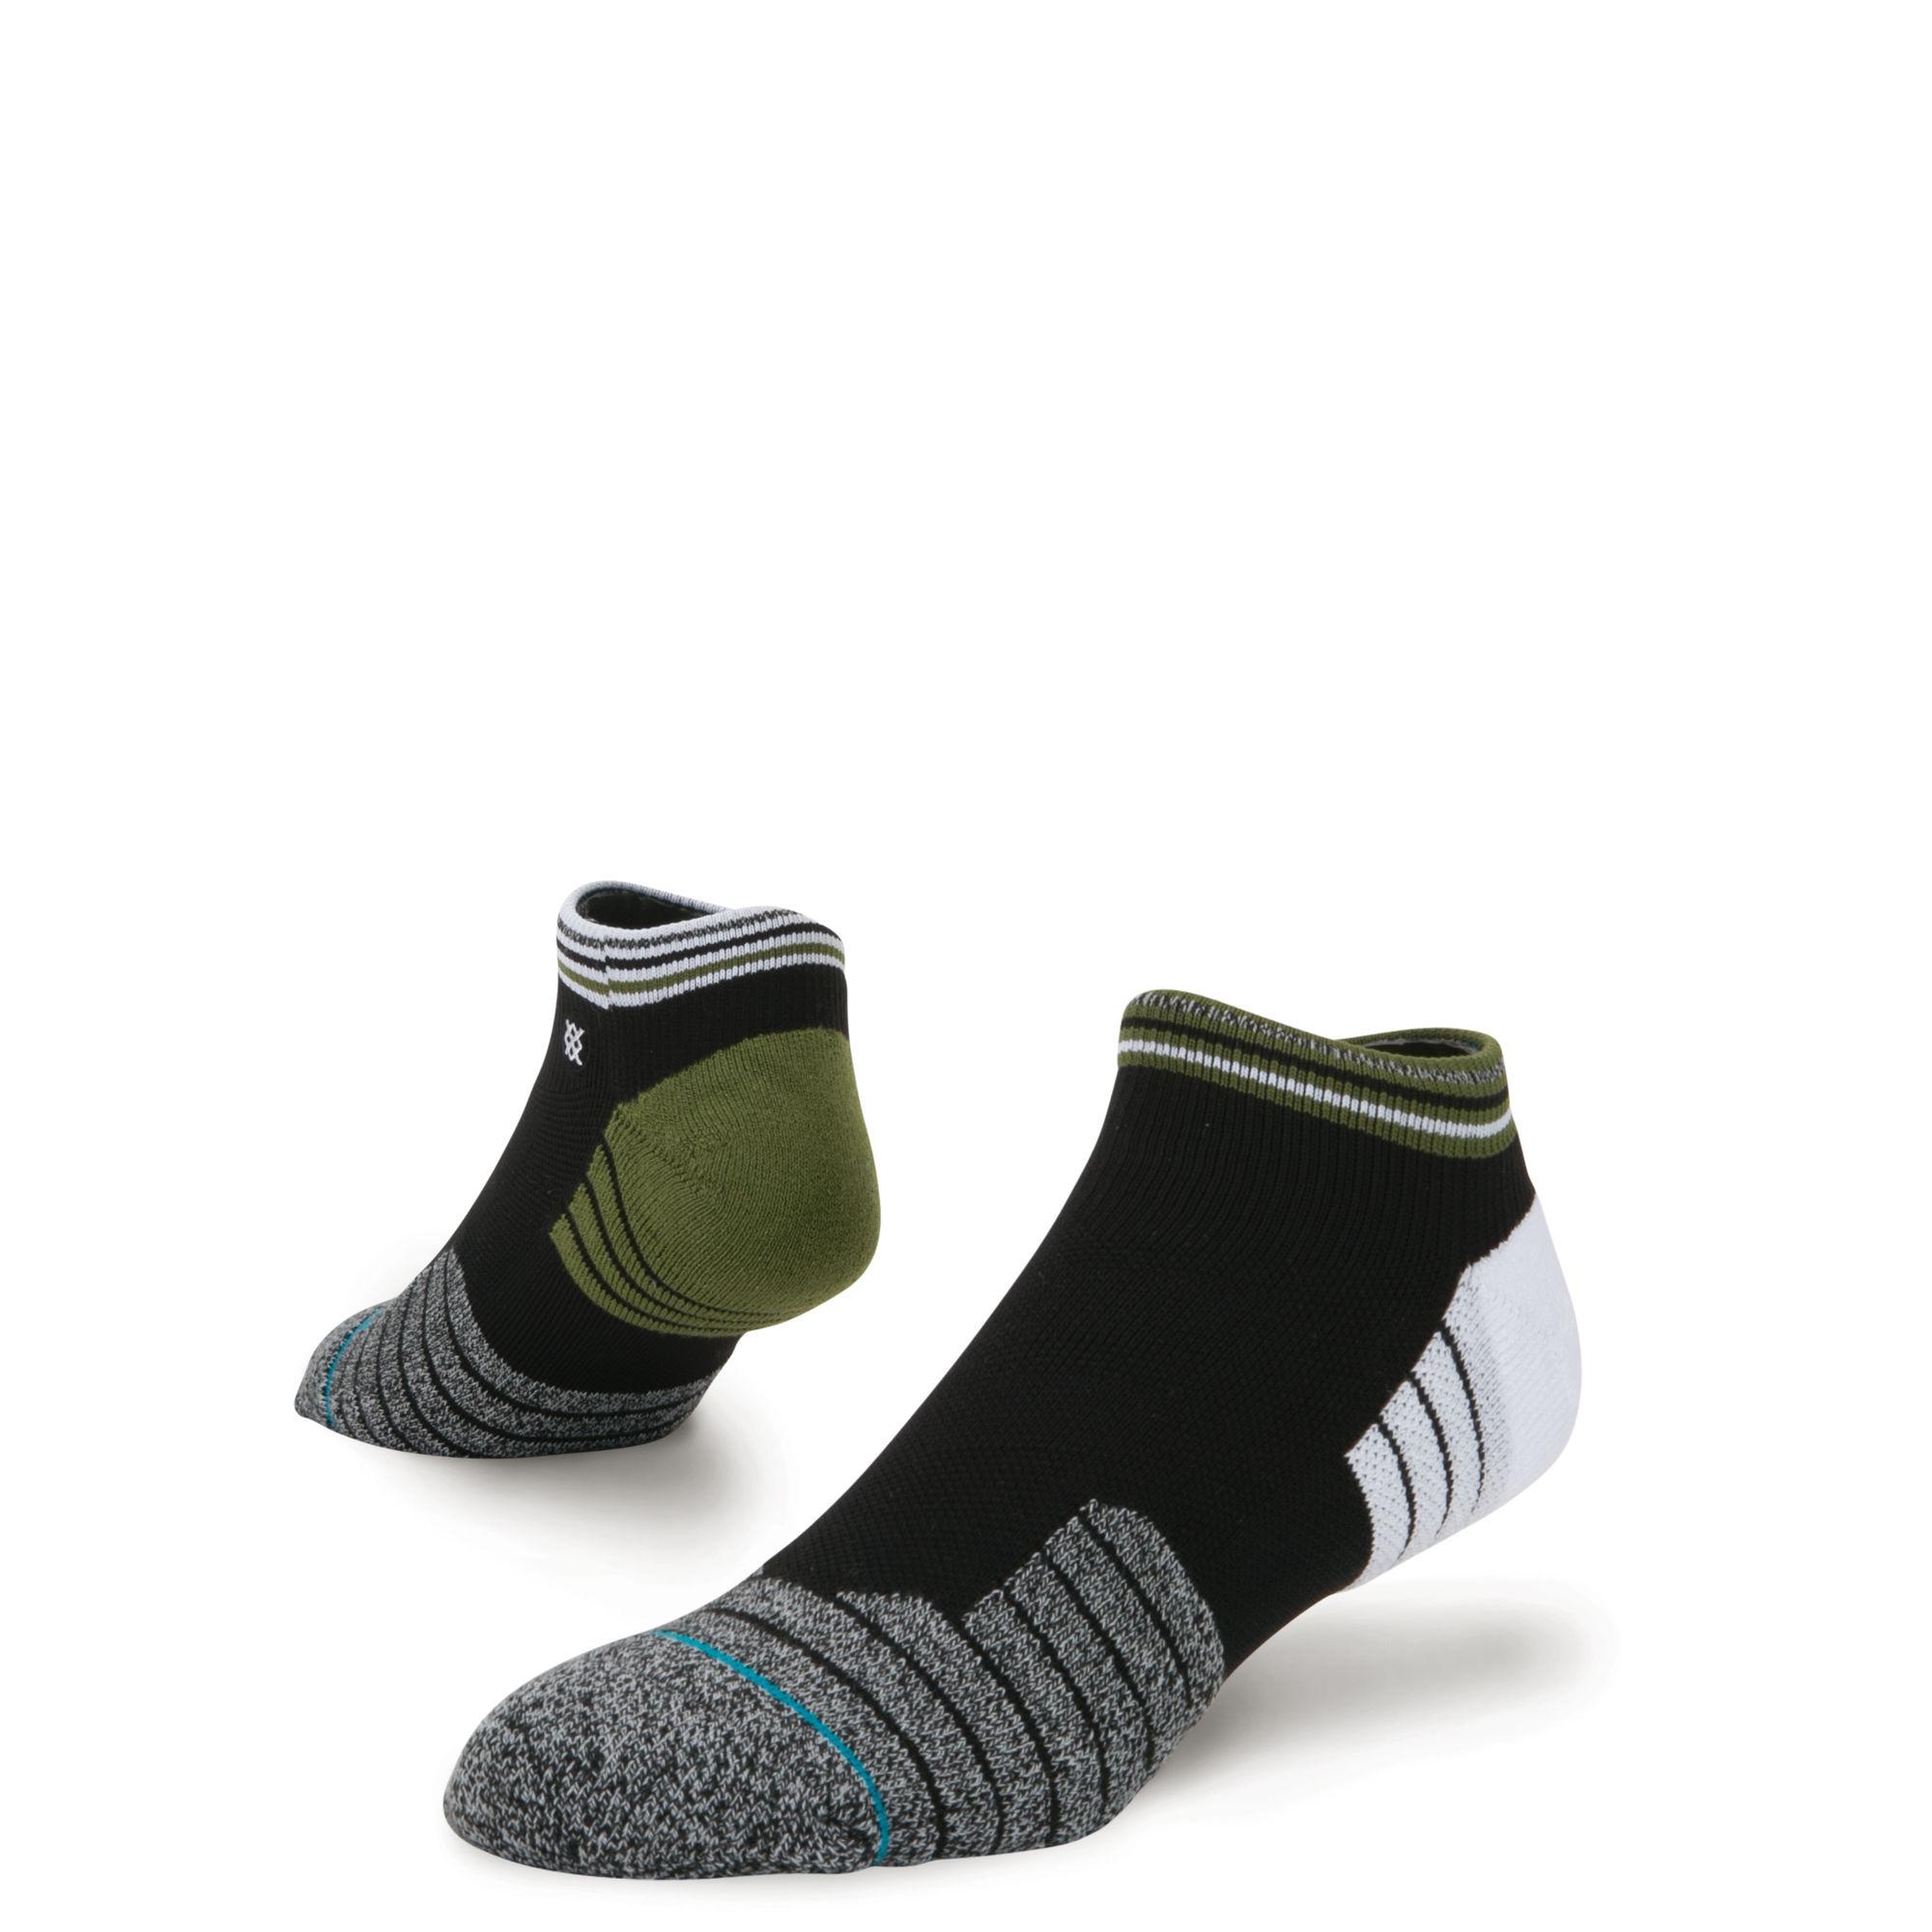 Athletic socks...